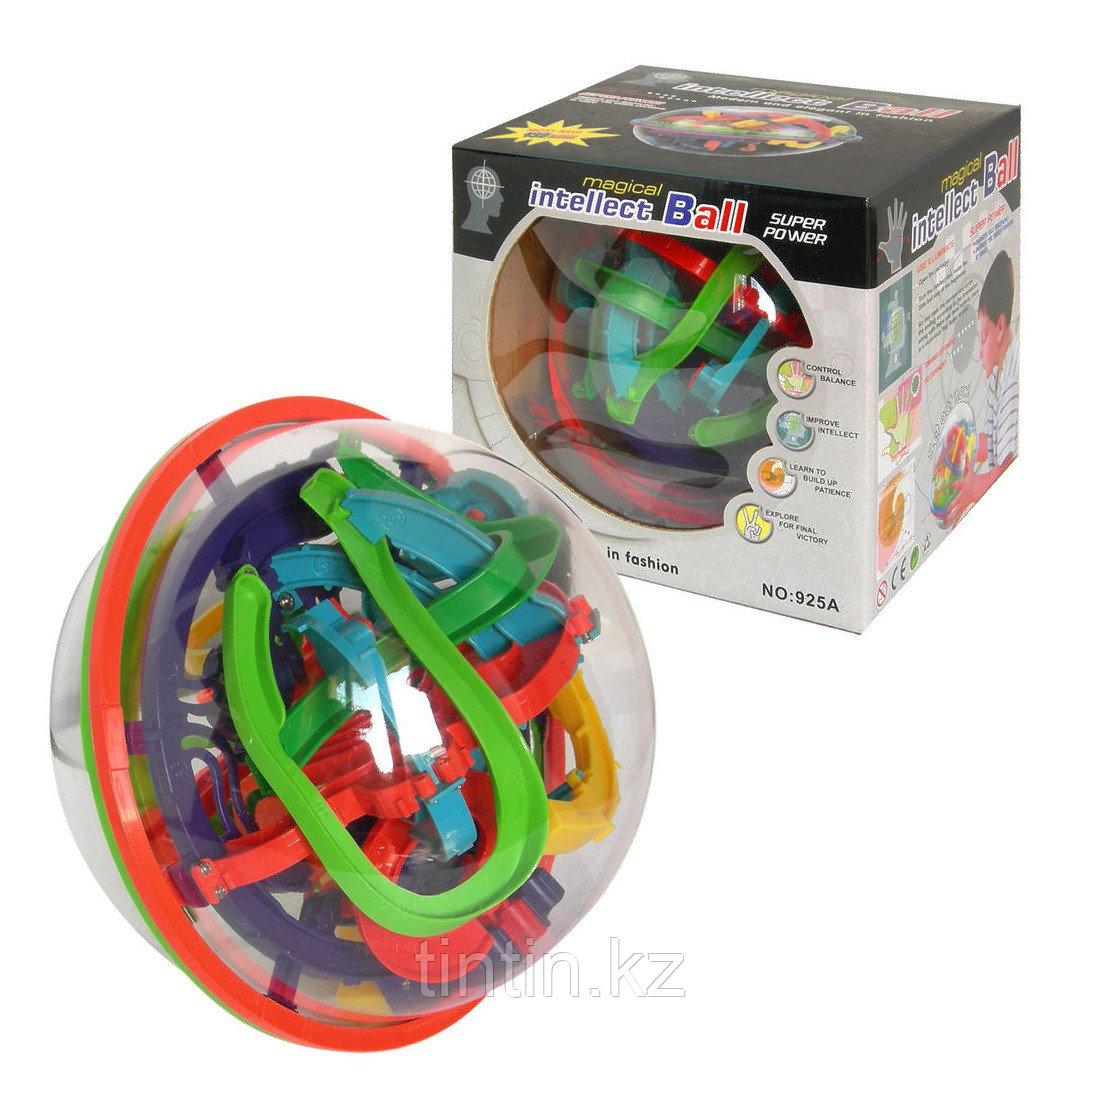 3D шар-лабиринт головоломка Magical Intellect Ball 138 шагов